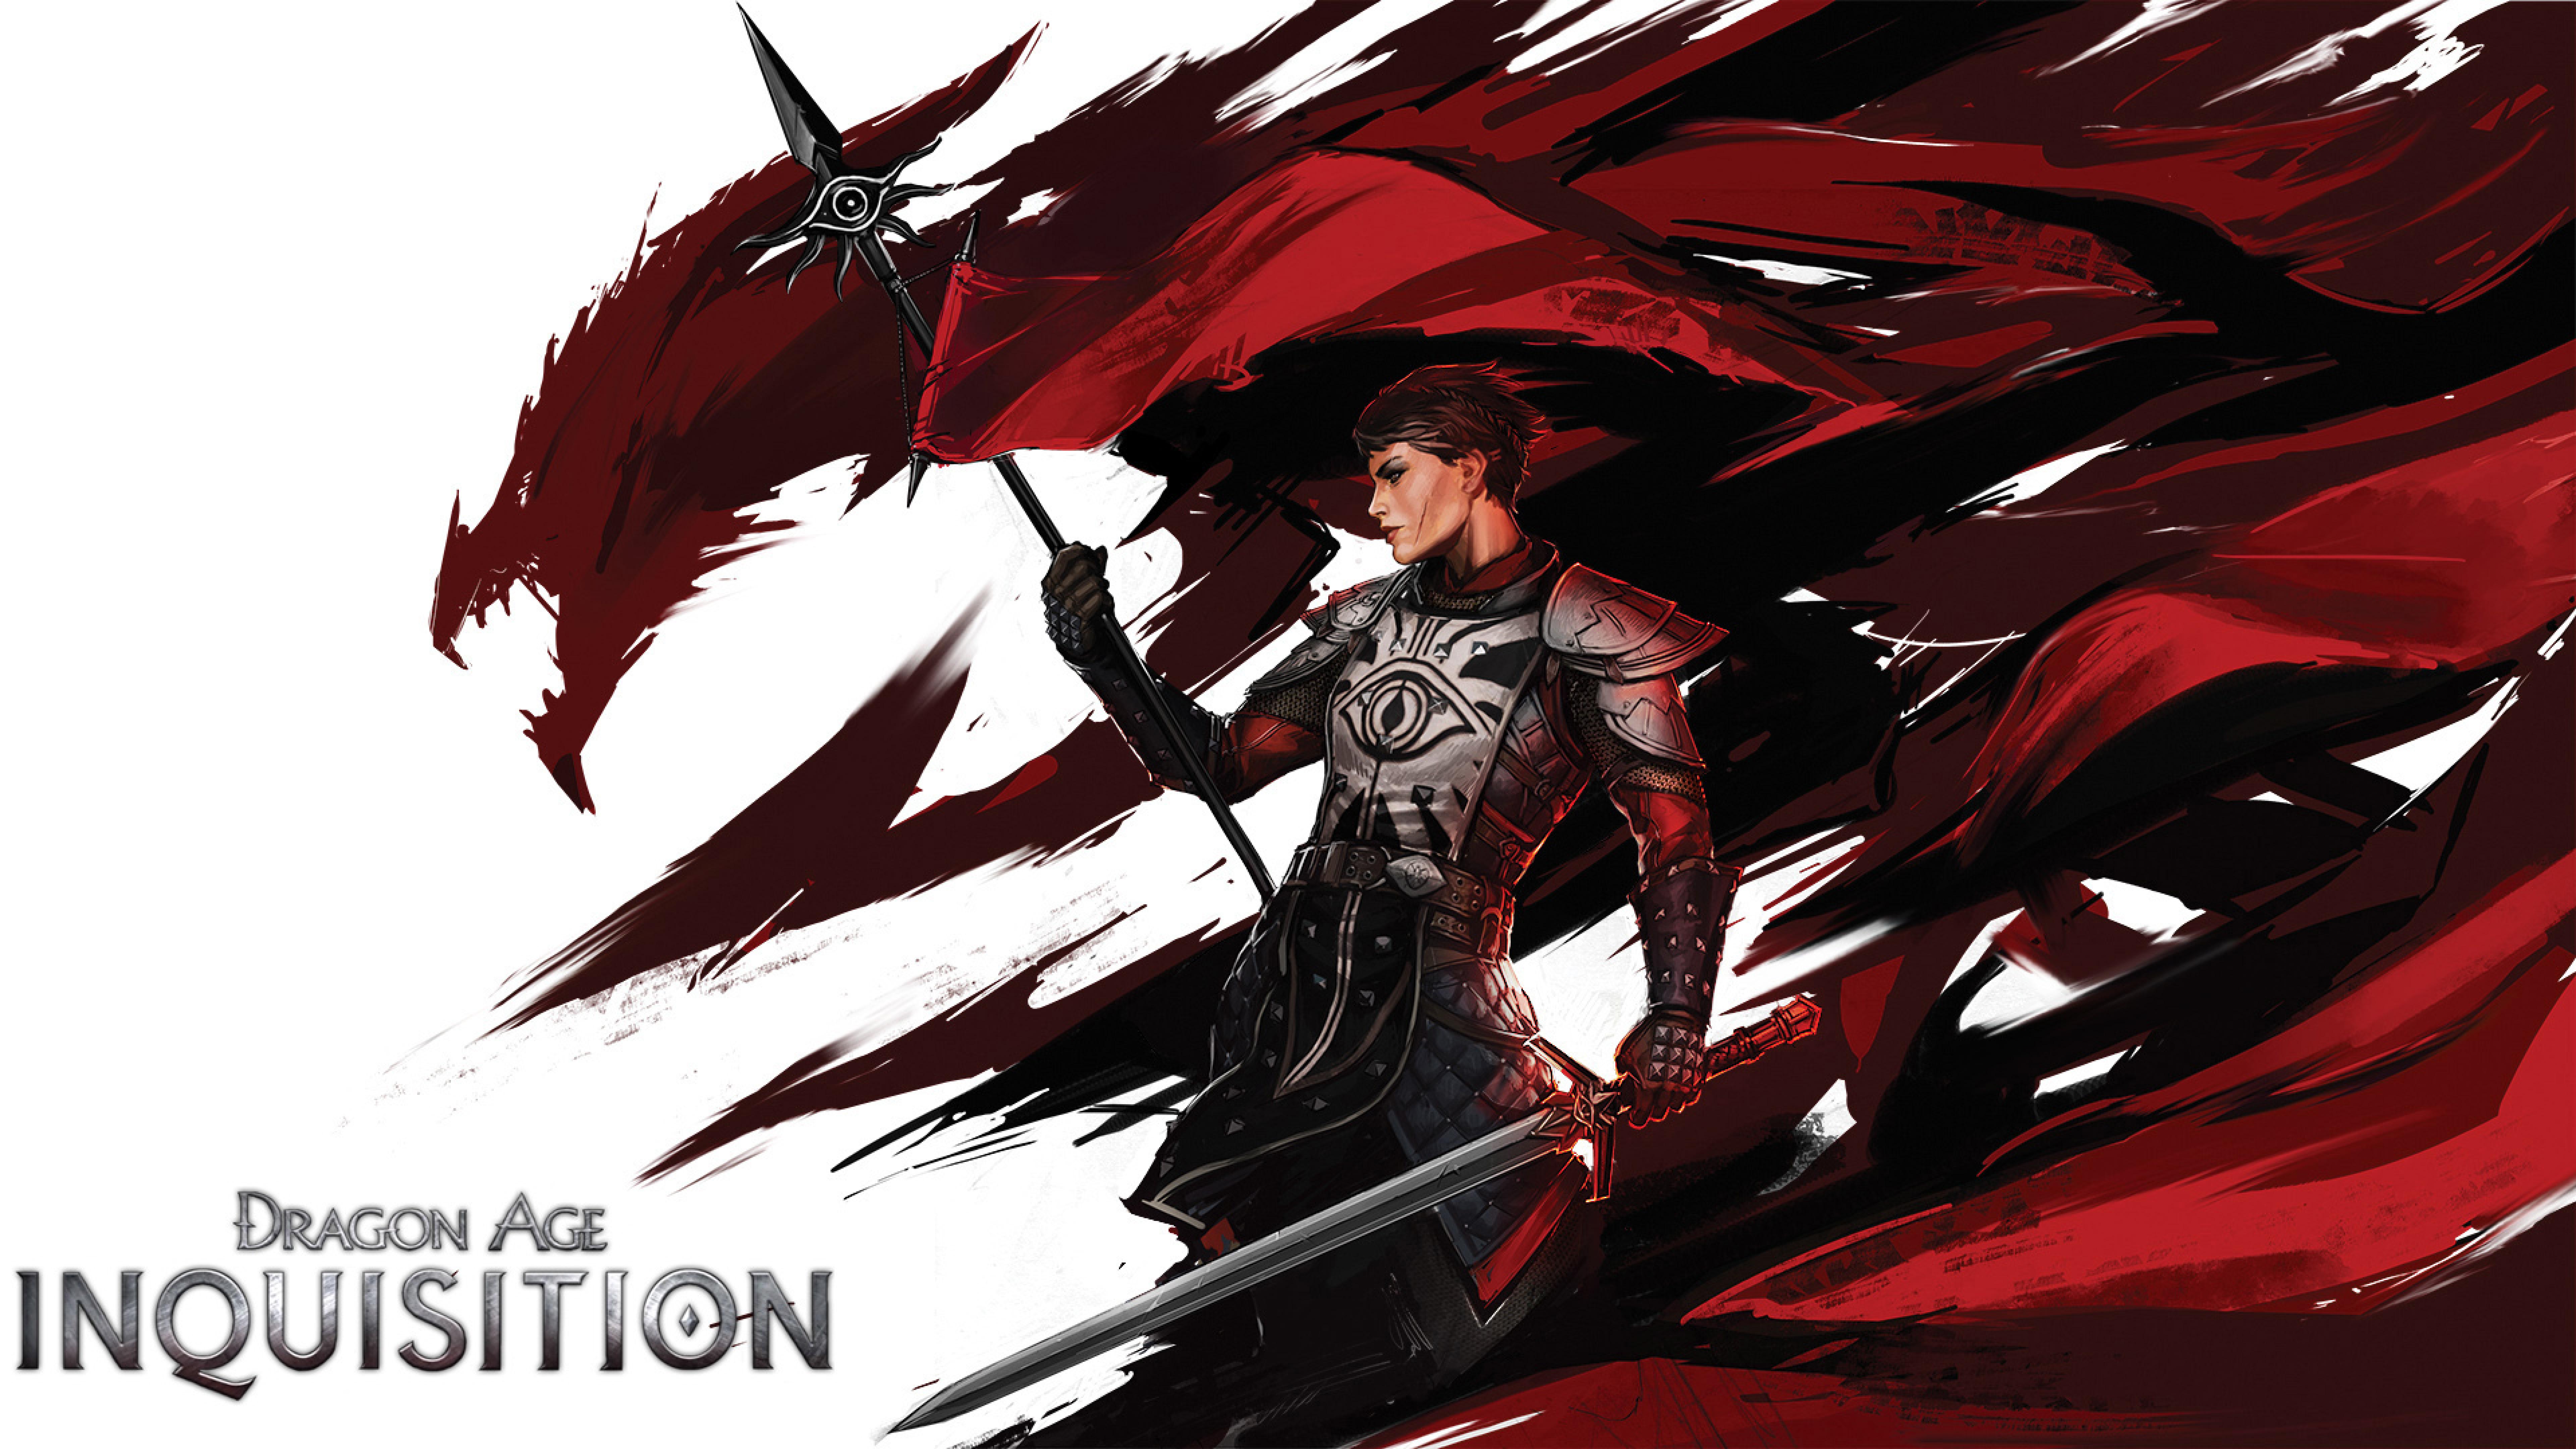 Dragon Age 3 Inquisition  № 1901439 бесплатно